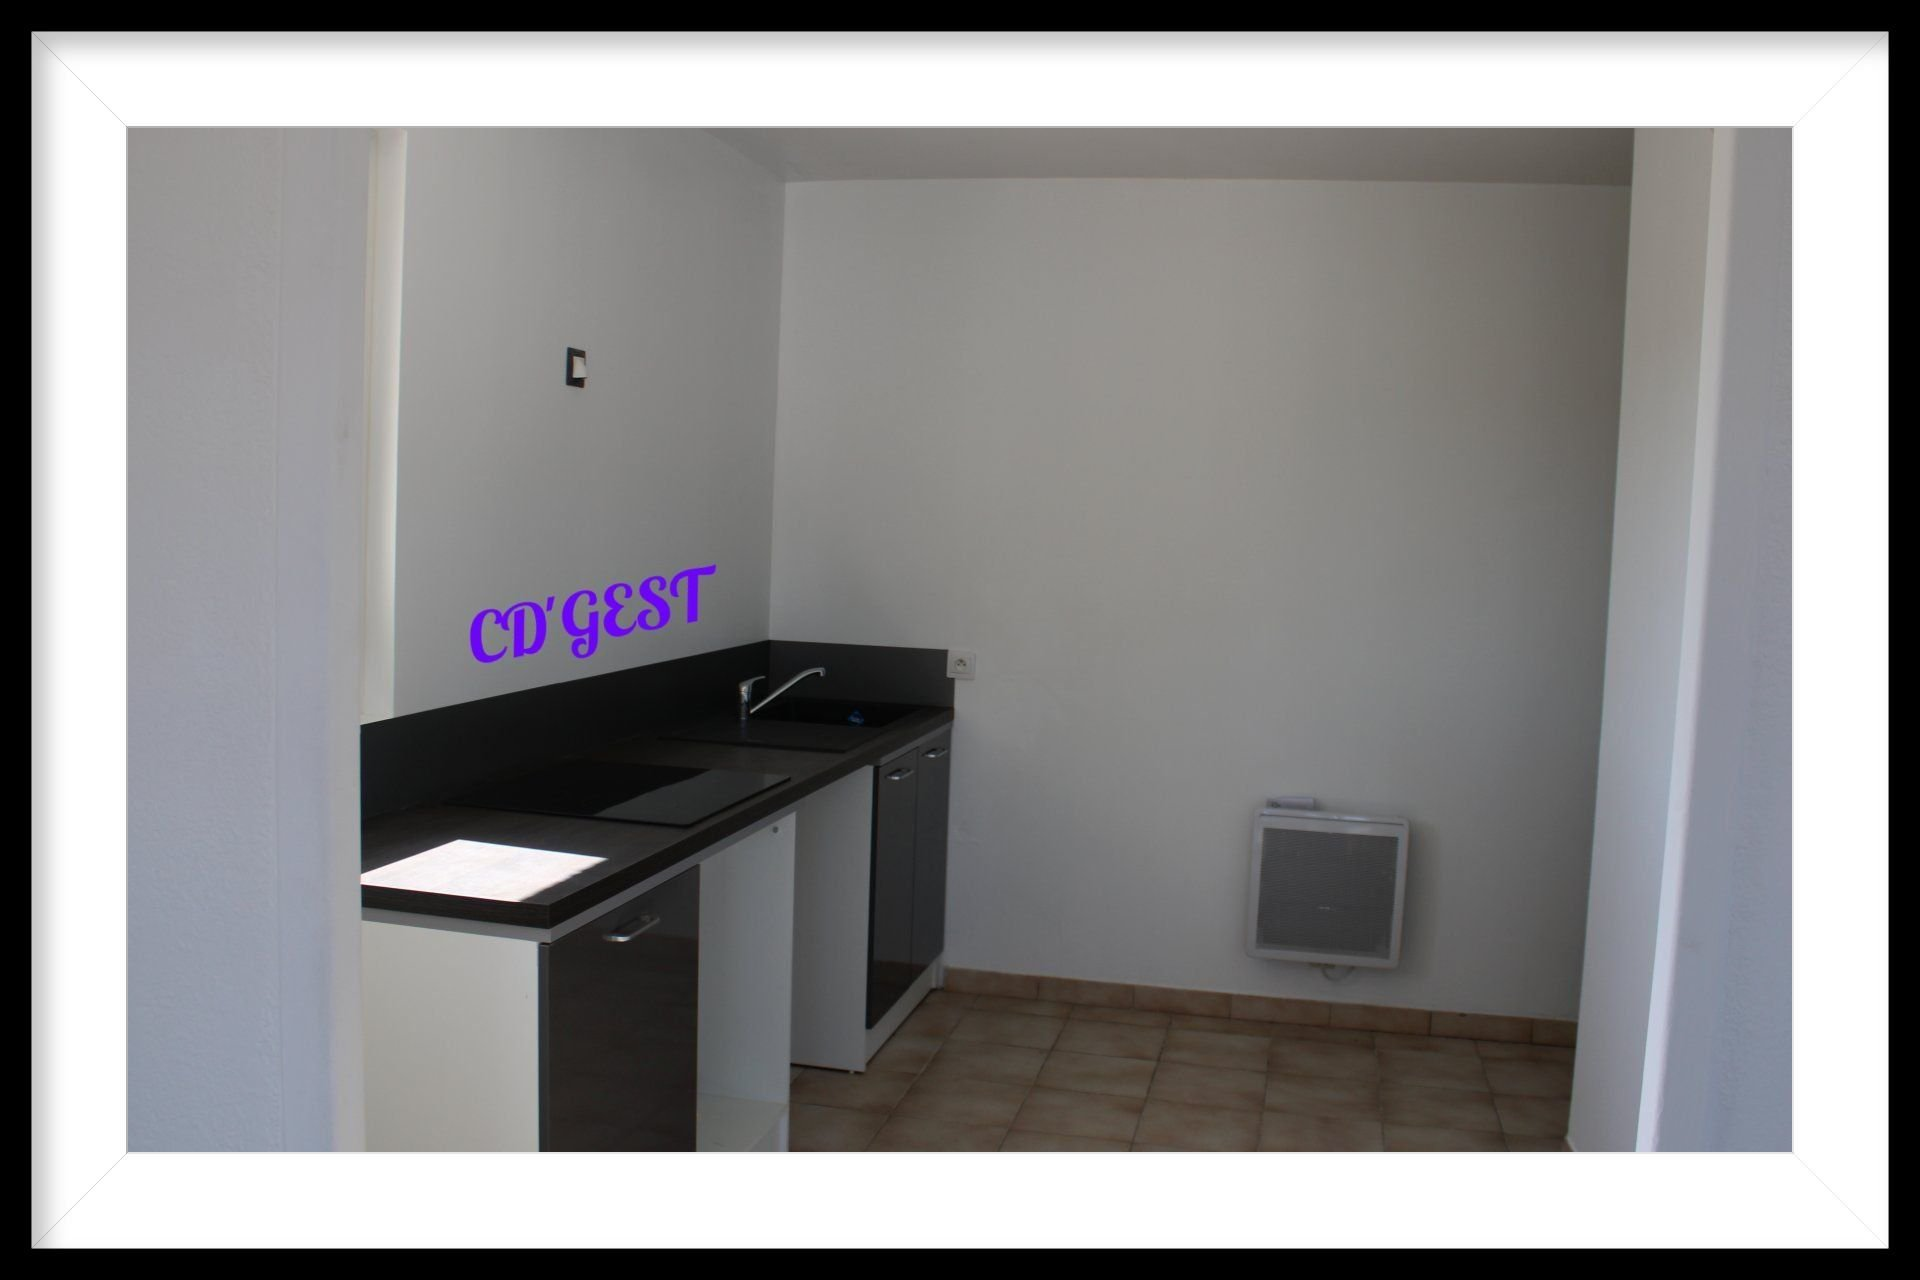 Appartement 3 chambre proche centre ville